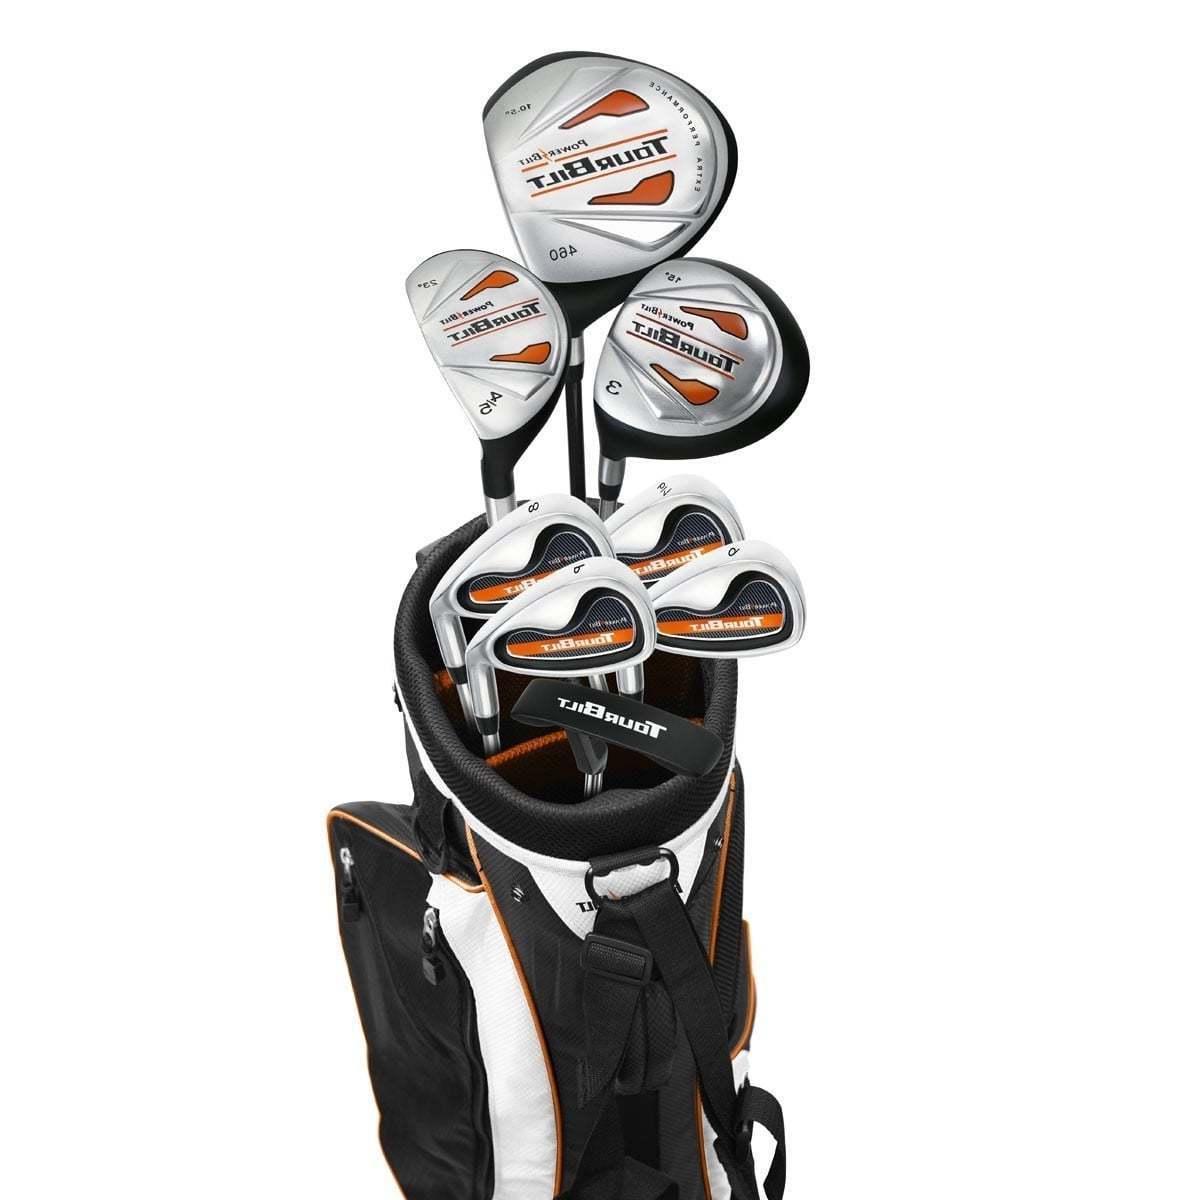 ANY SIZE BOY'S LEFT Hand TOURBILT Complete Golf Set wBag+Dr+